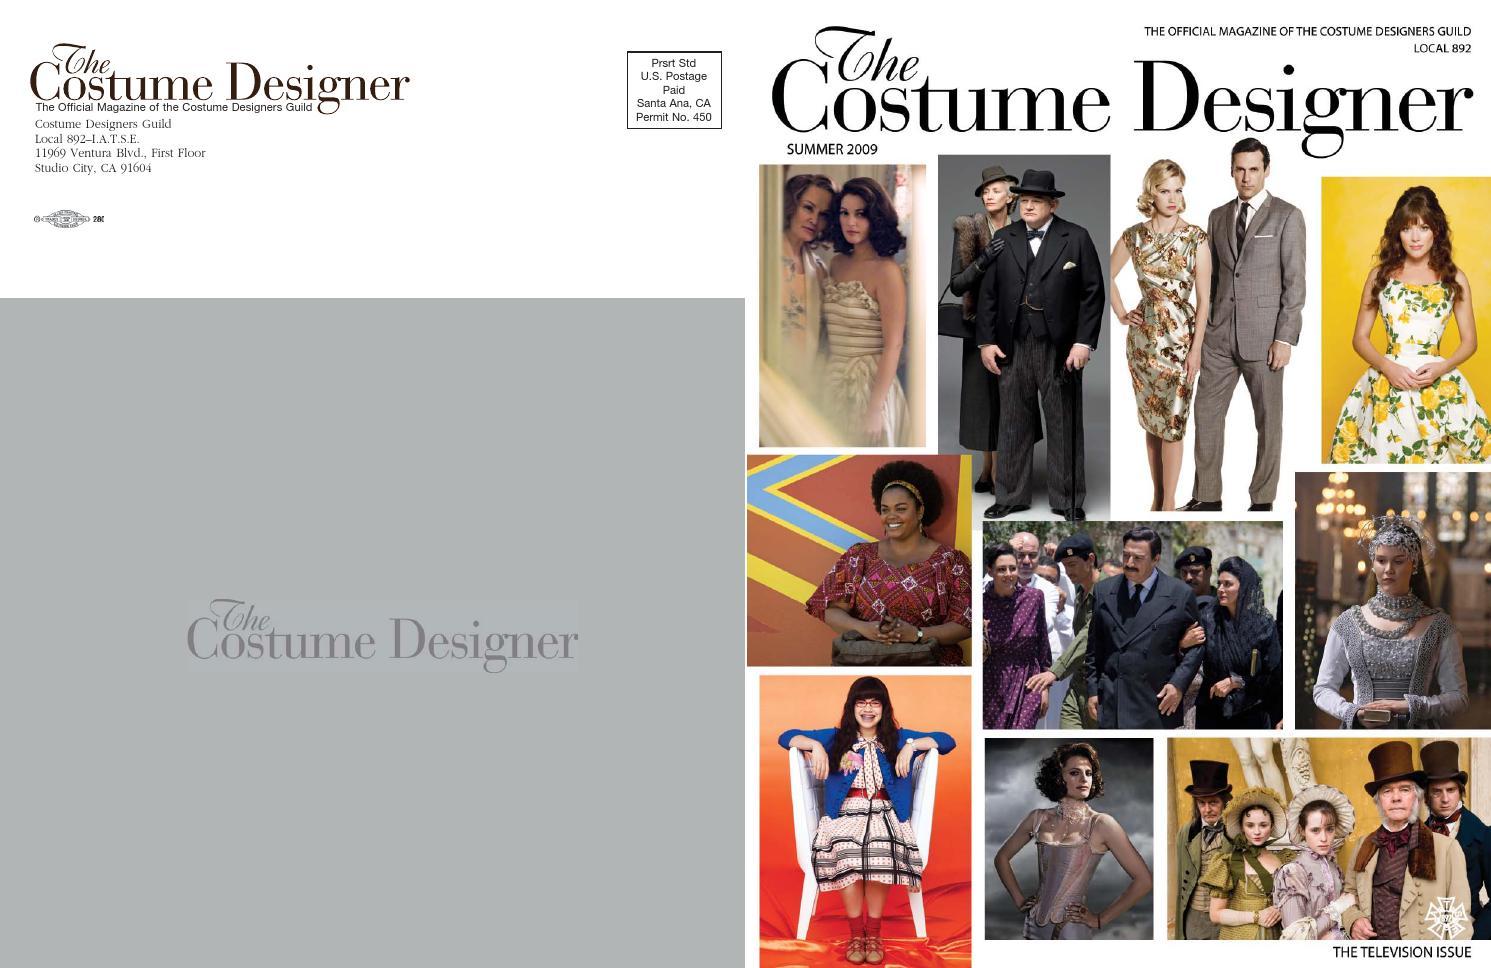 The Costume Designer Summer 2009 By Costume Designers Guild Issuu